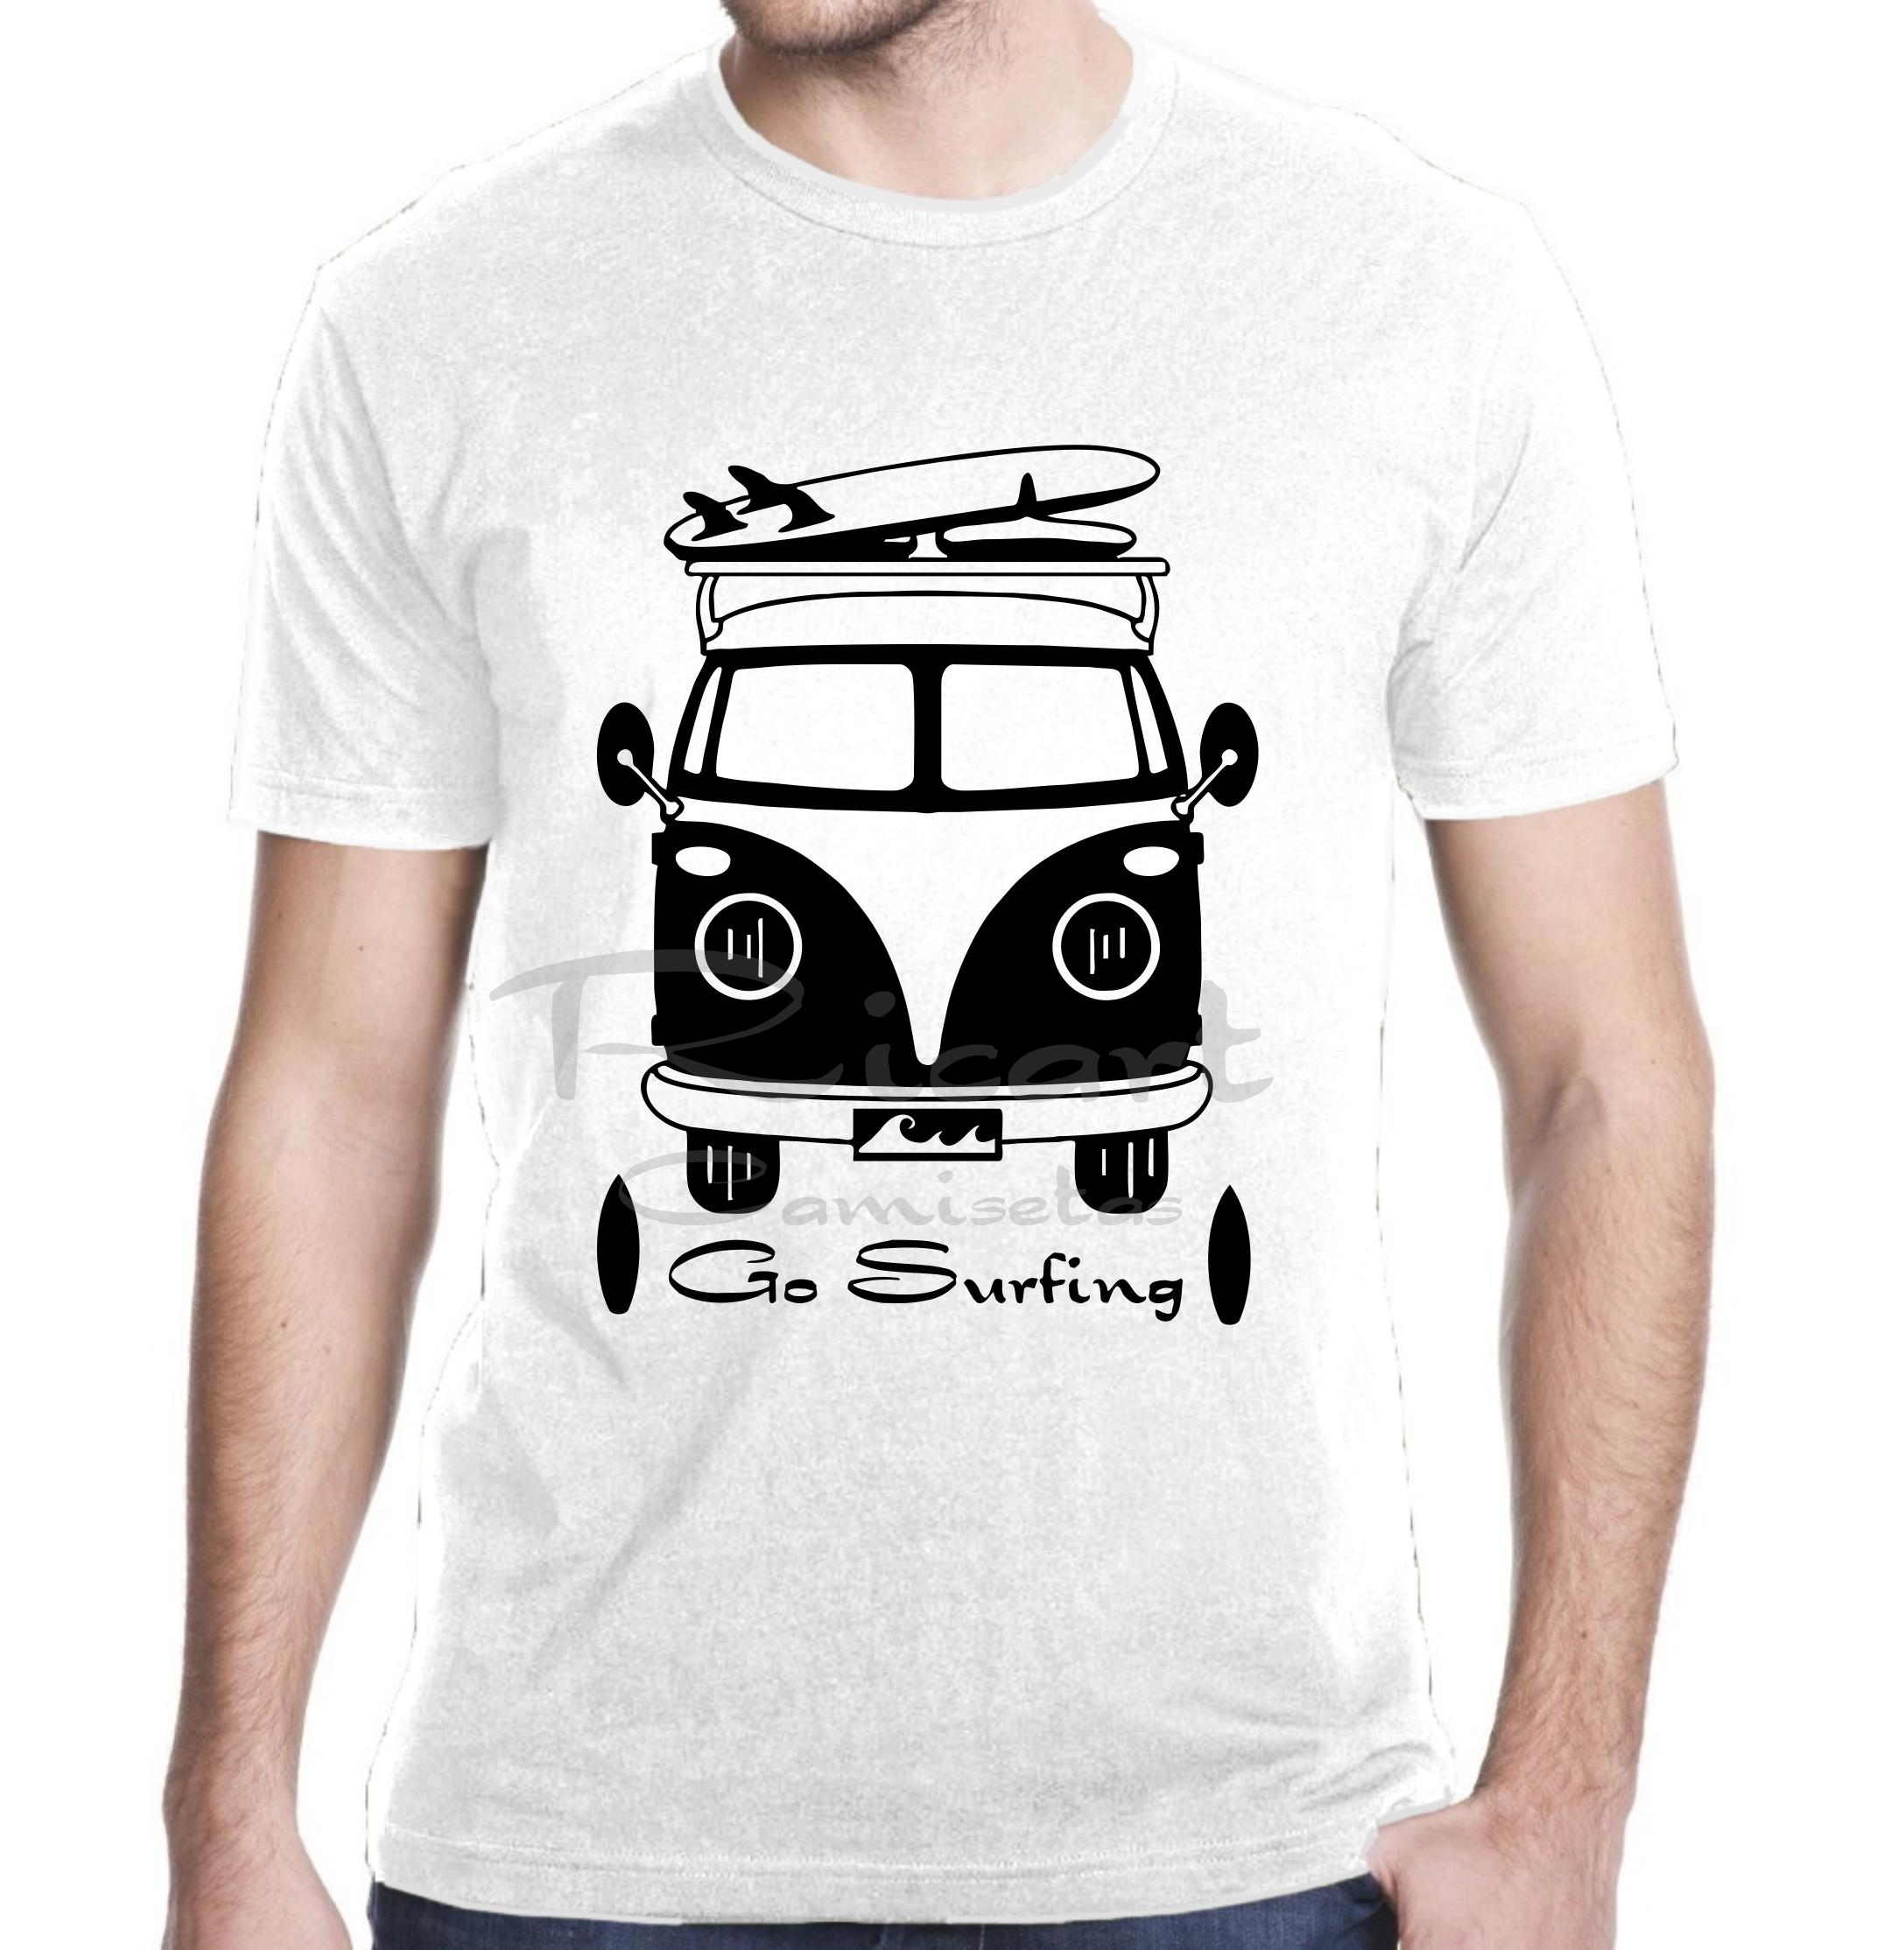 aee60f403 Camiseta de Antigos